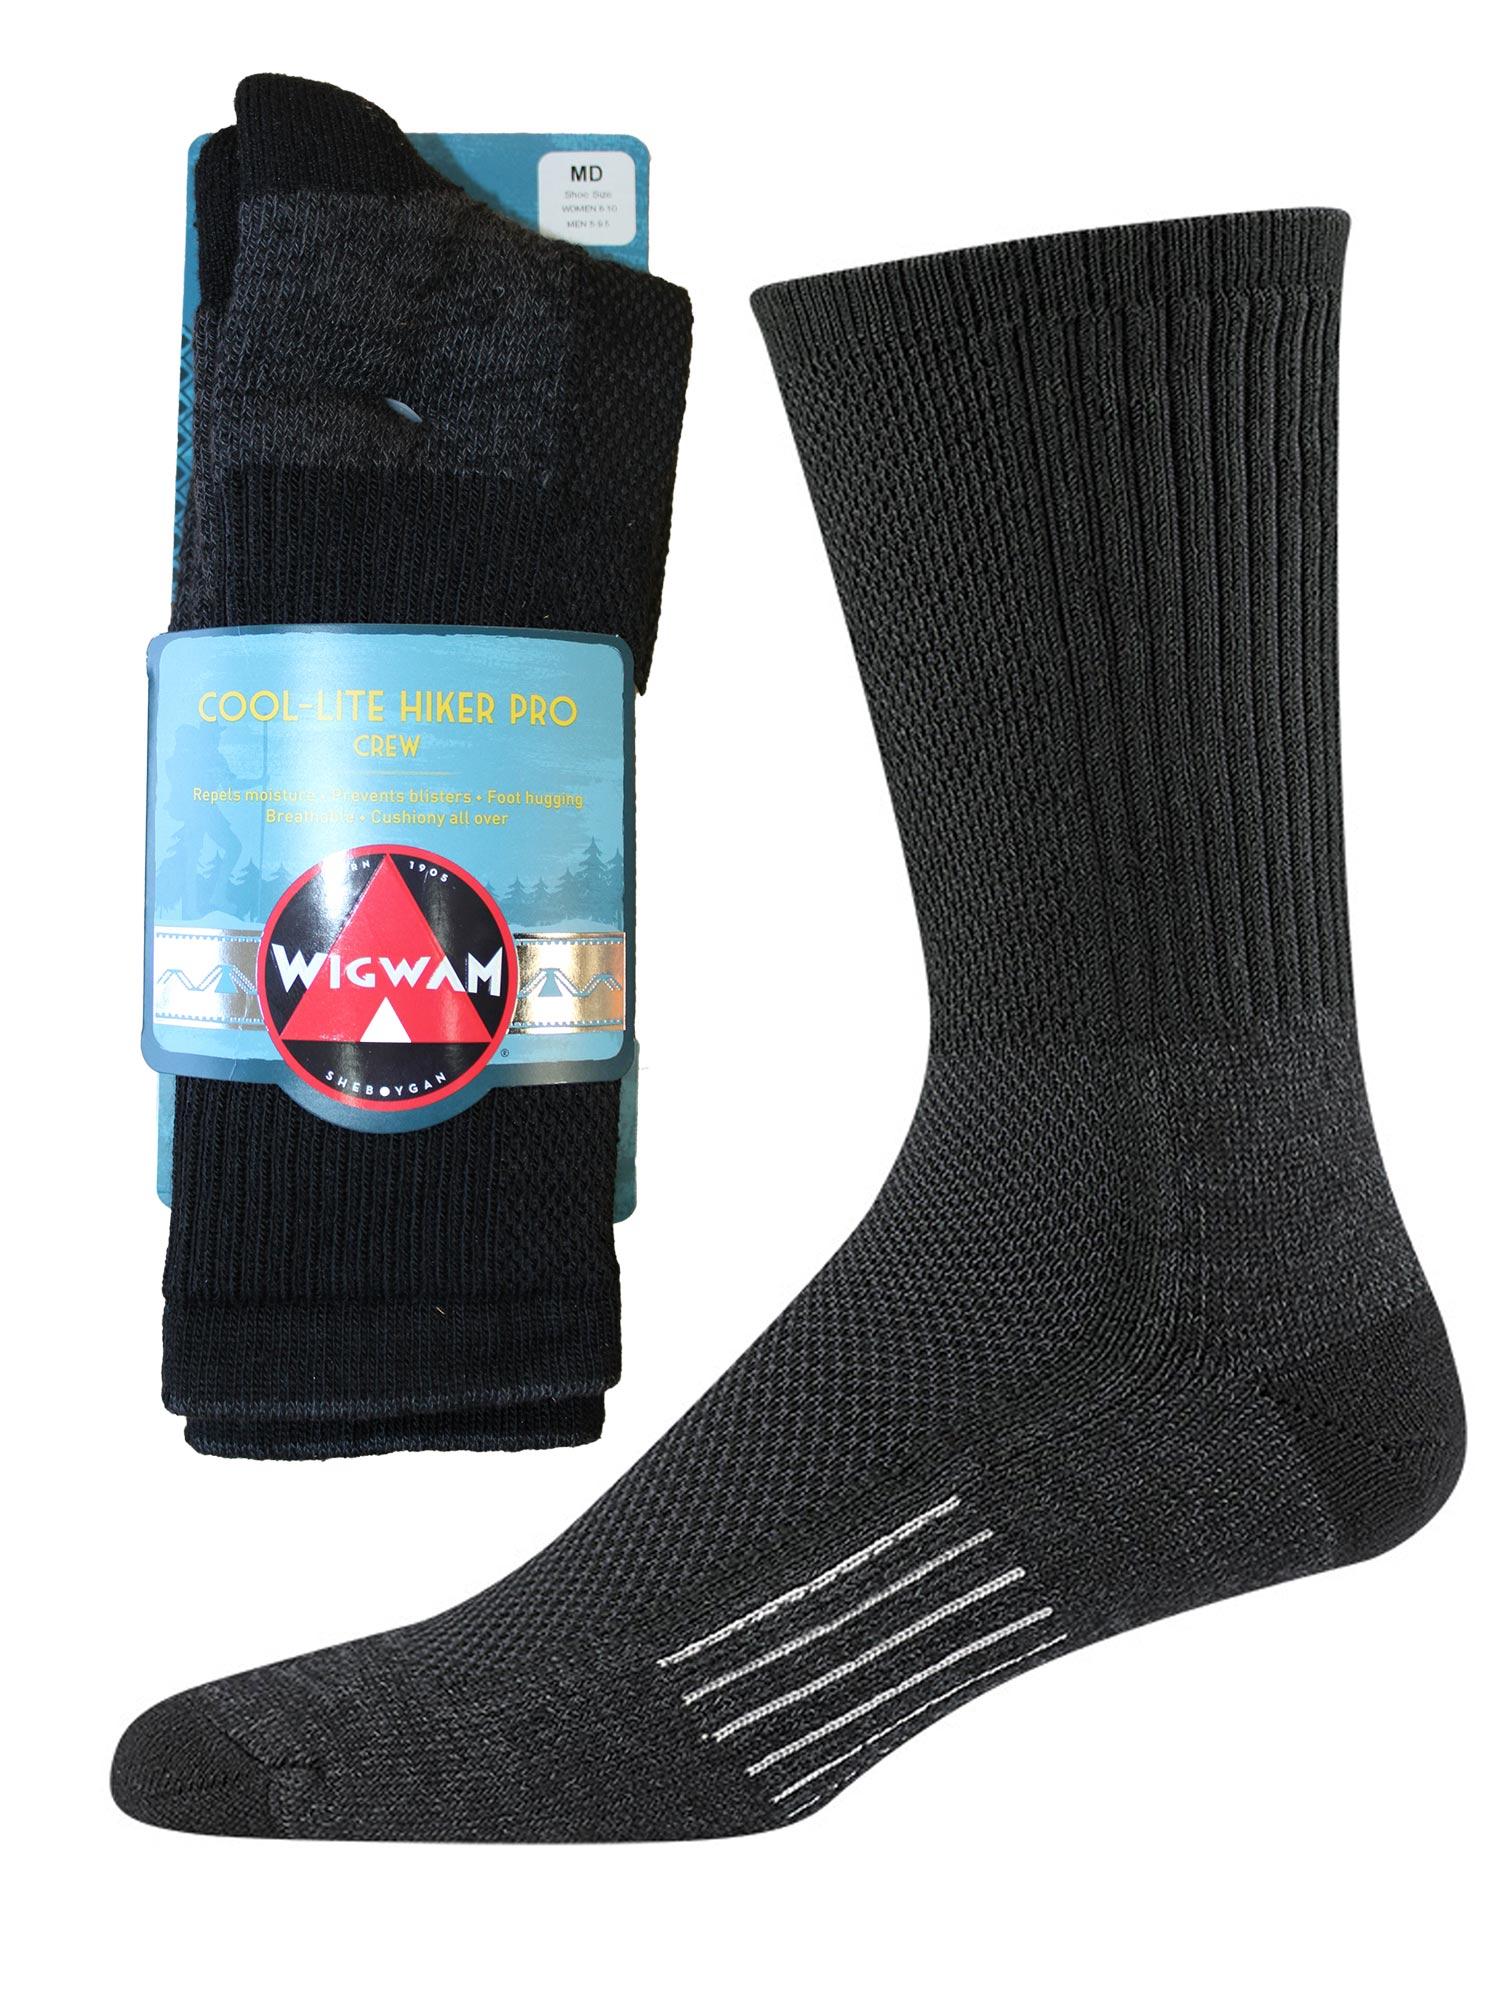 Cool Crew Socks Wigwam Cool Lite Hiker...